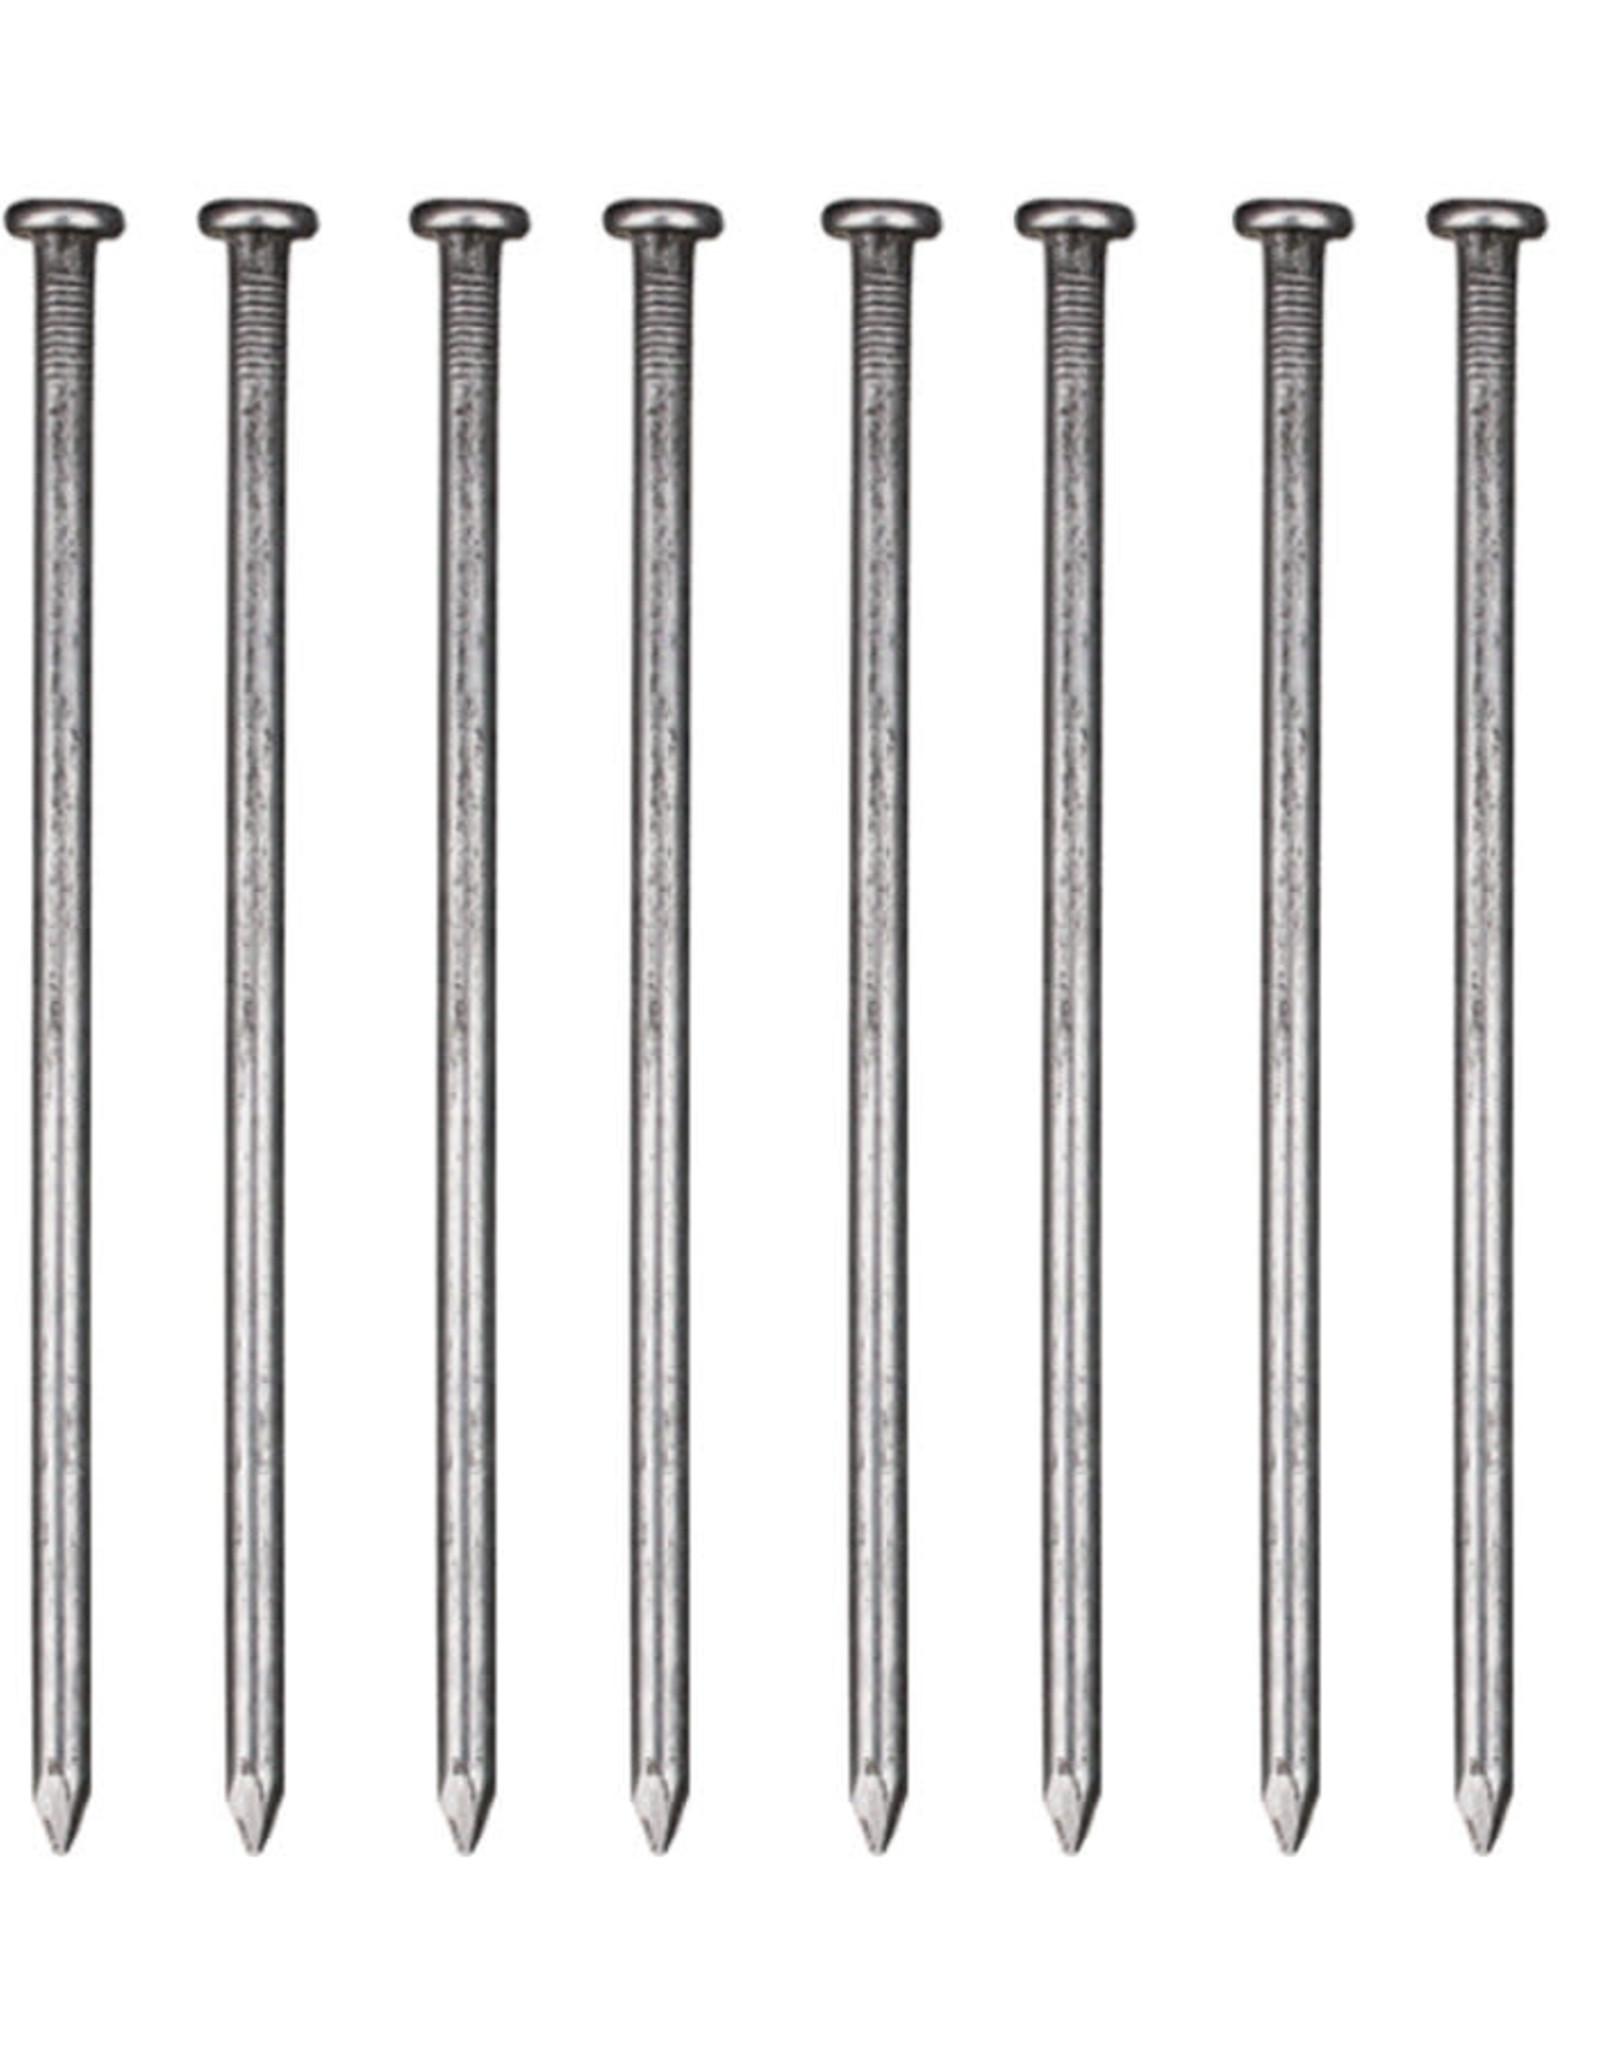 "SEK Surebond SEK SUREBOND 10"" Steel Spikes, 150CT Box"